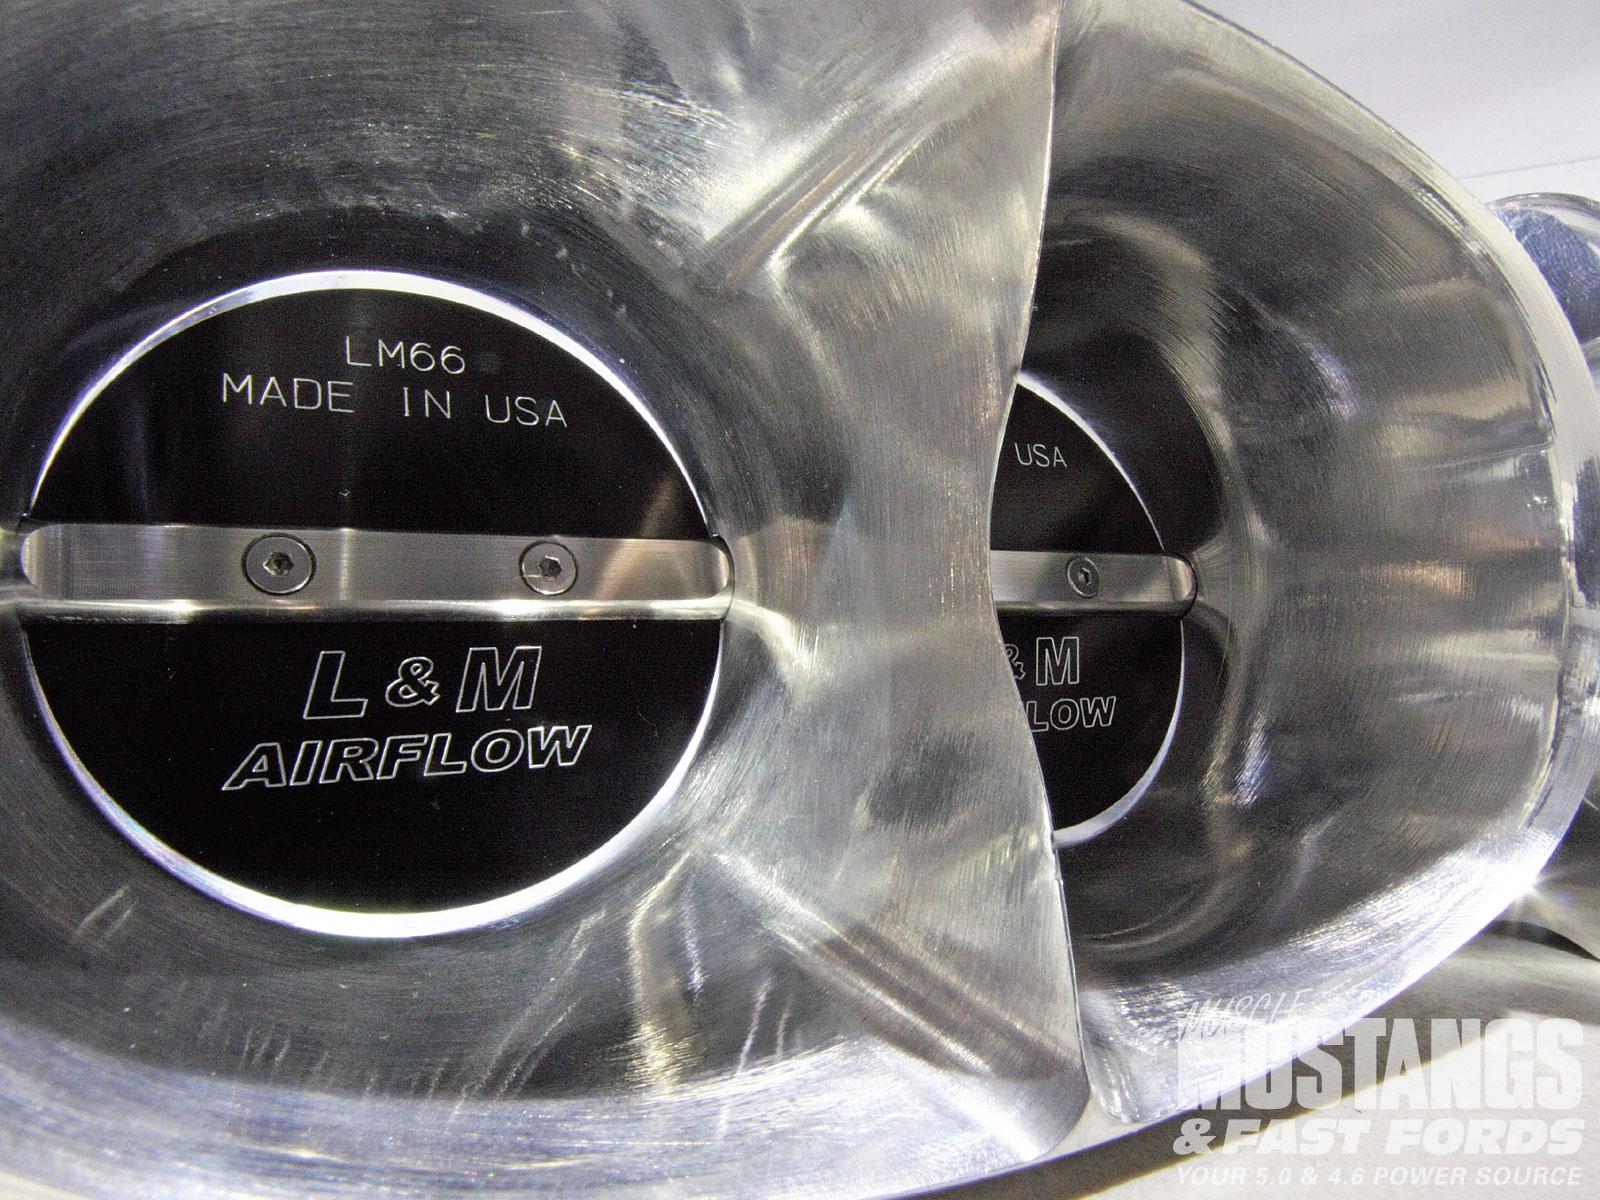 Mmfp 1011 05 O 2010 Shelby Gt500 Lm Airflow Dual Bore Throttle Body Vortex Generator